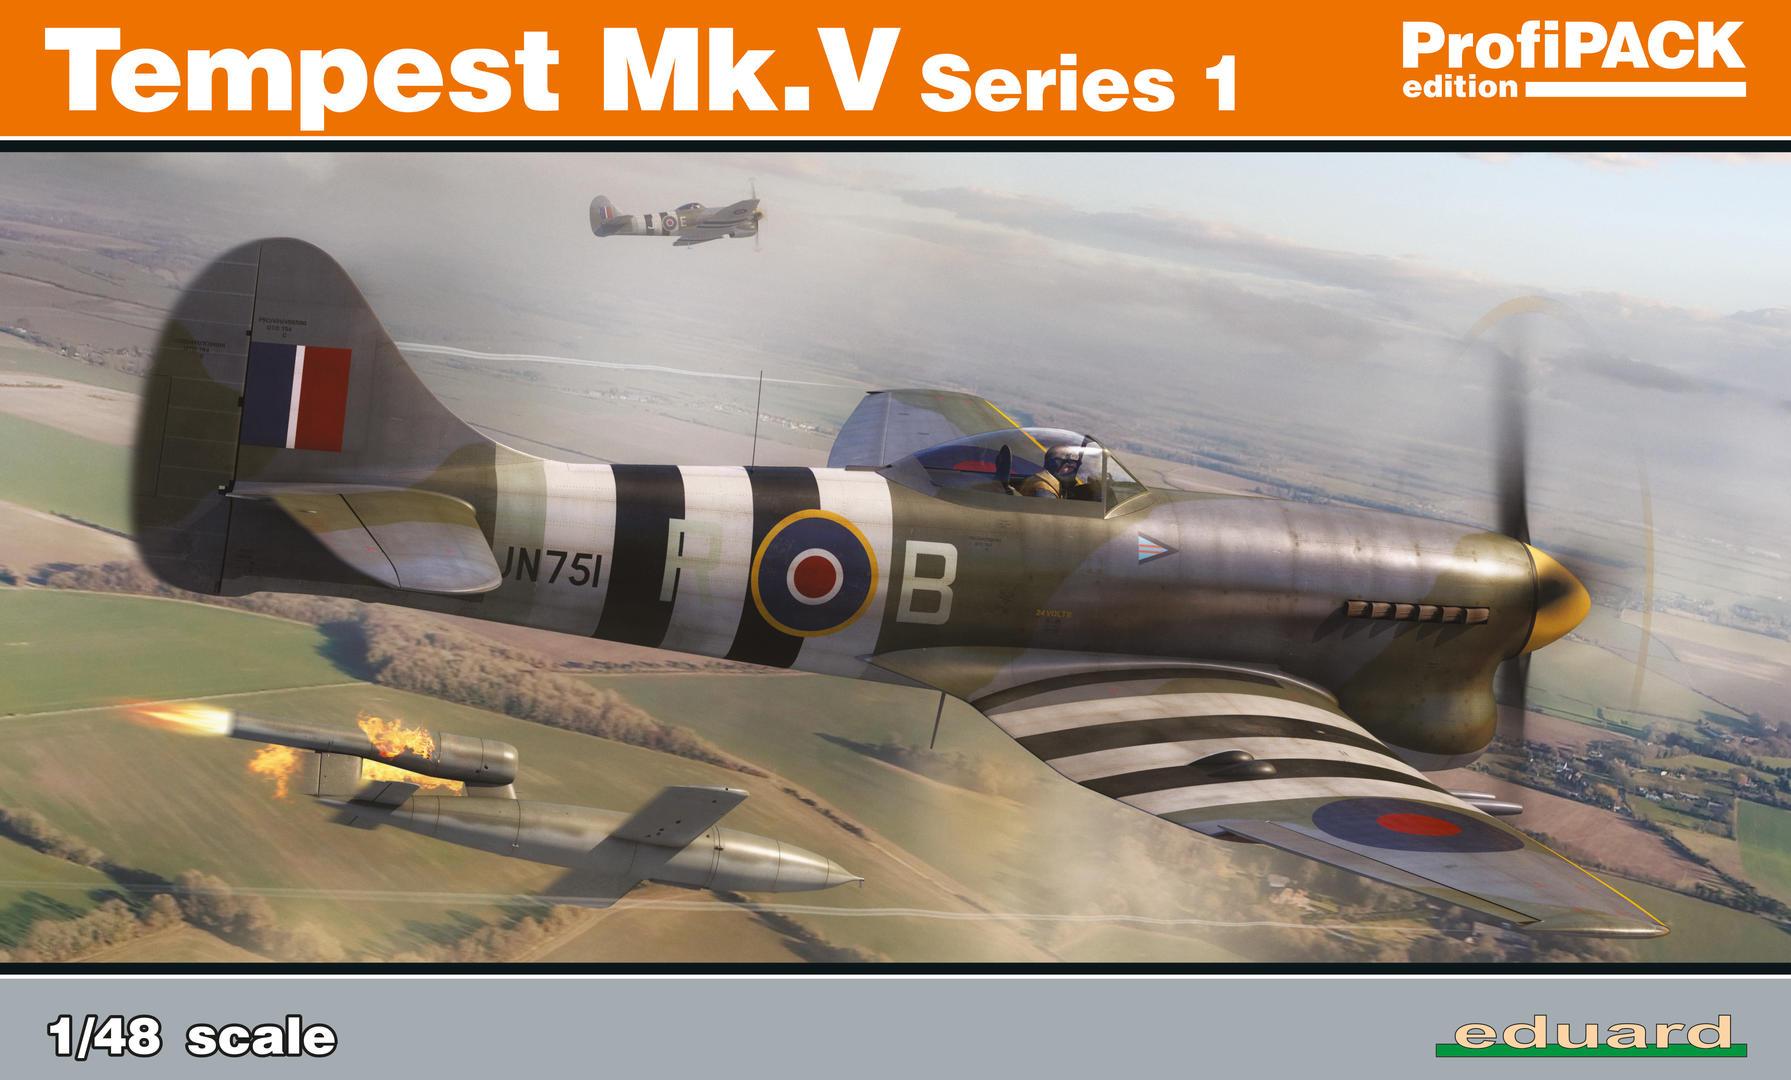 Eduard-82121-Tempest-Mk.-V Hawker Tempest Mk. V Series 1 im Maßstab 1:48 von Eduard PROFIPACK 82121